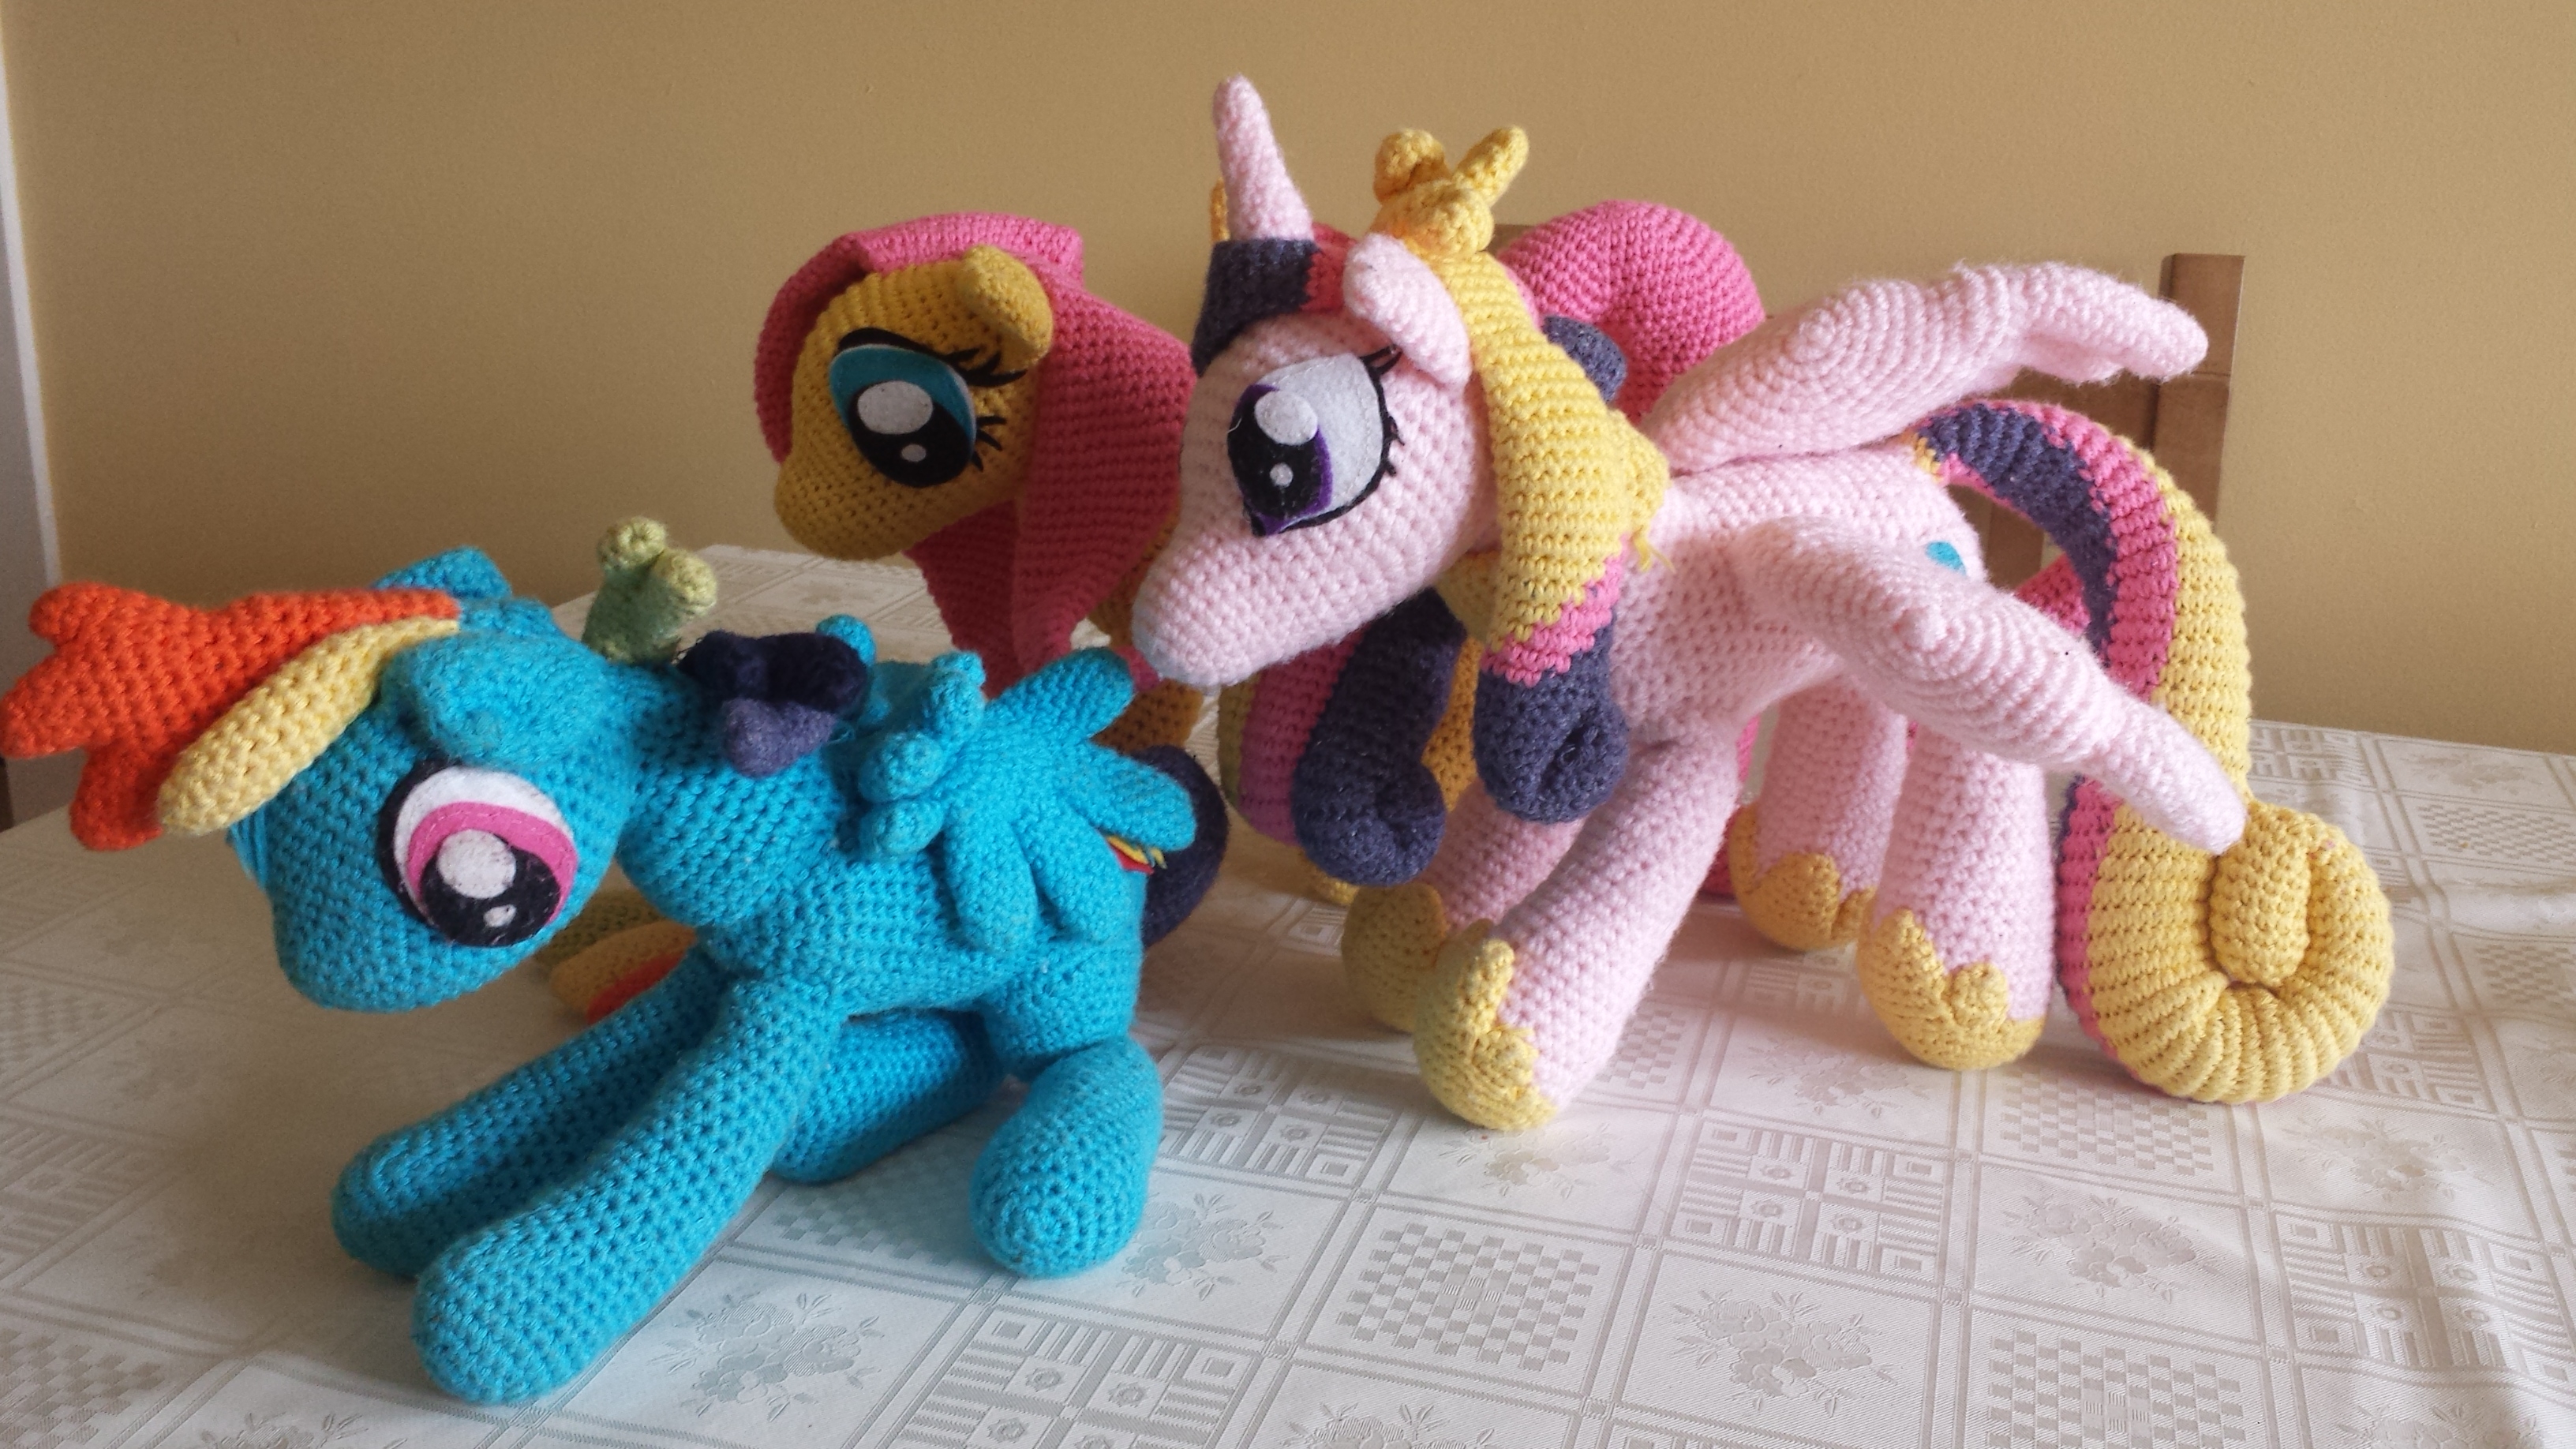 Amigurumi Pony Tutorial : My Little Pony Amigurumi PEEKO CRAFTS